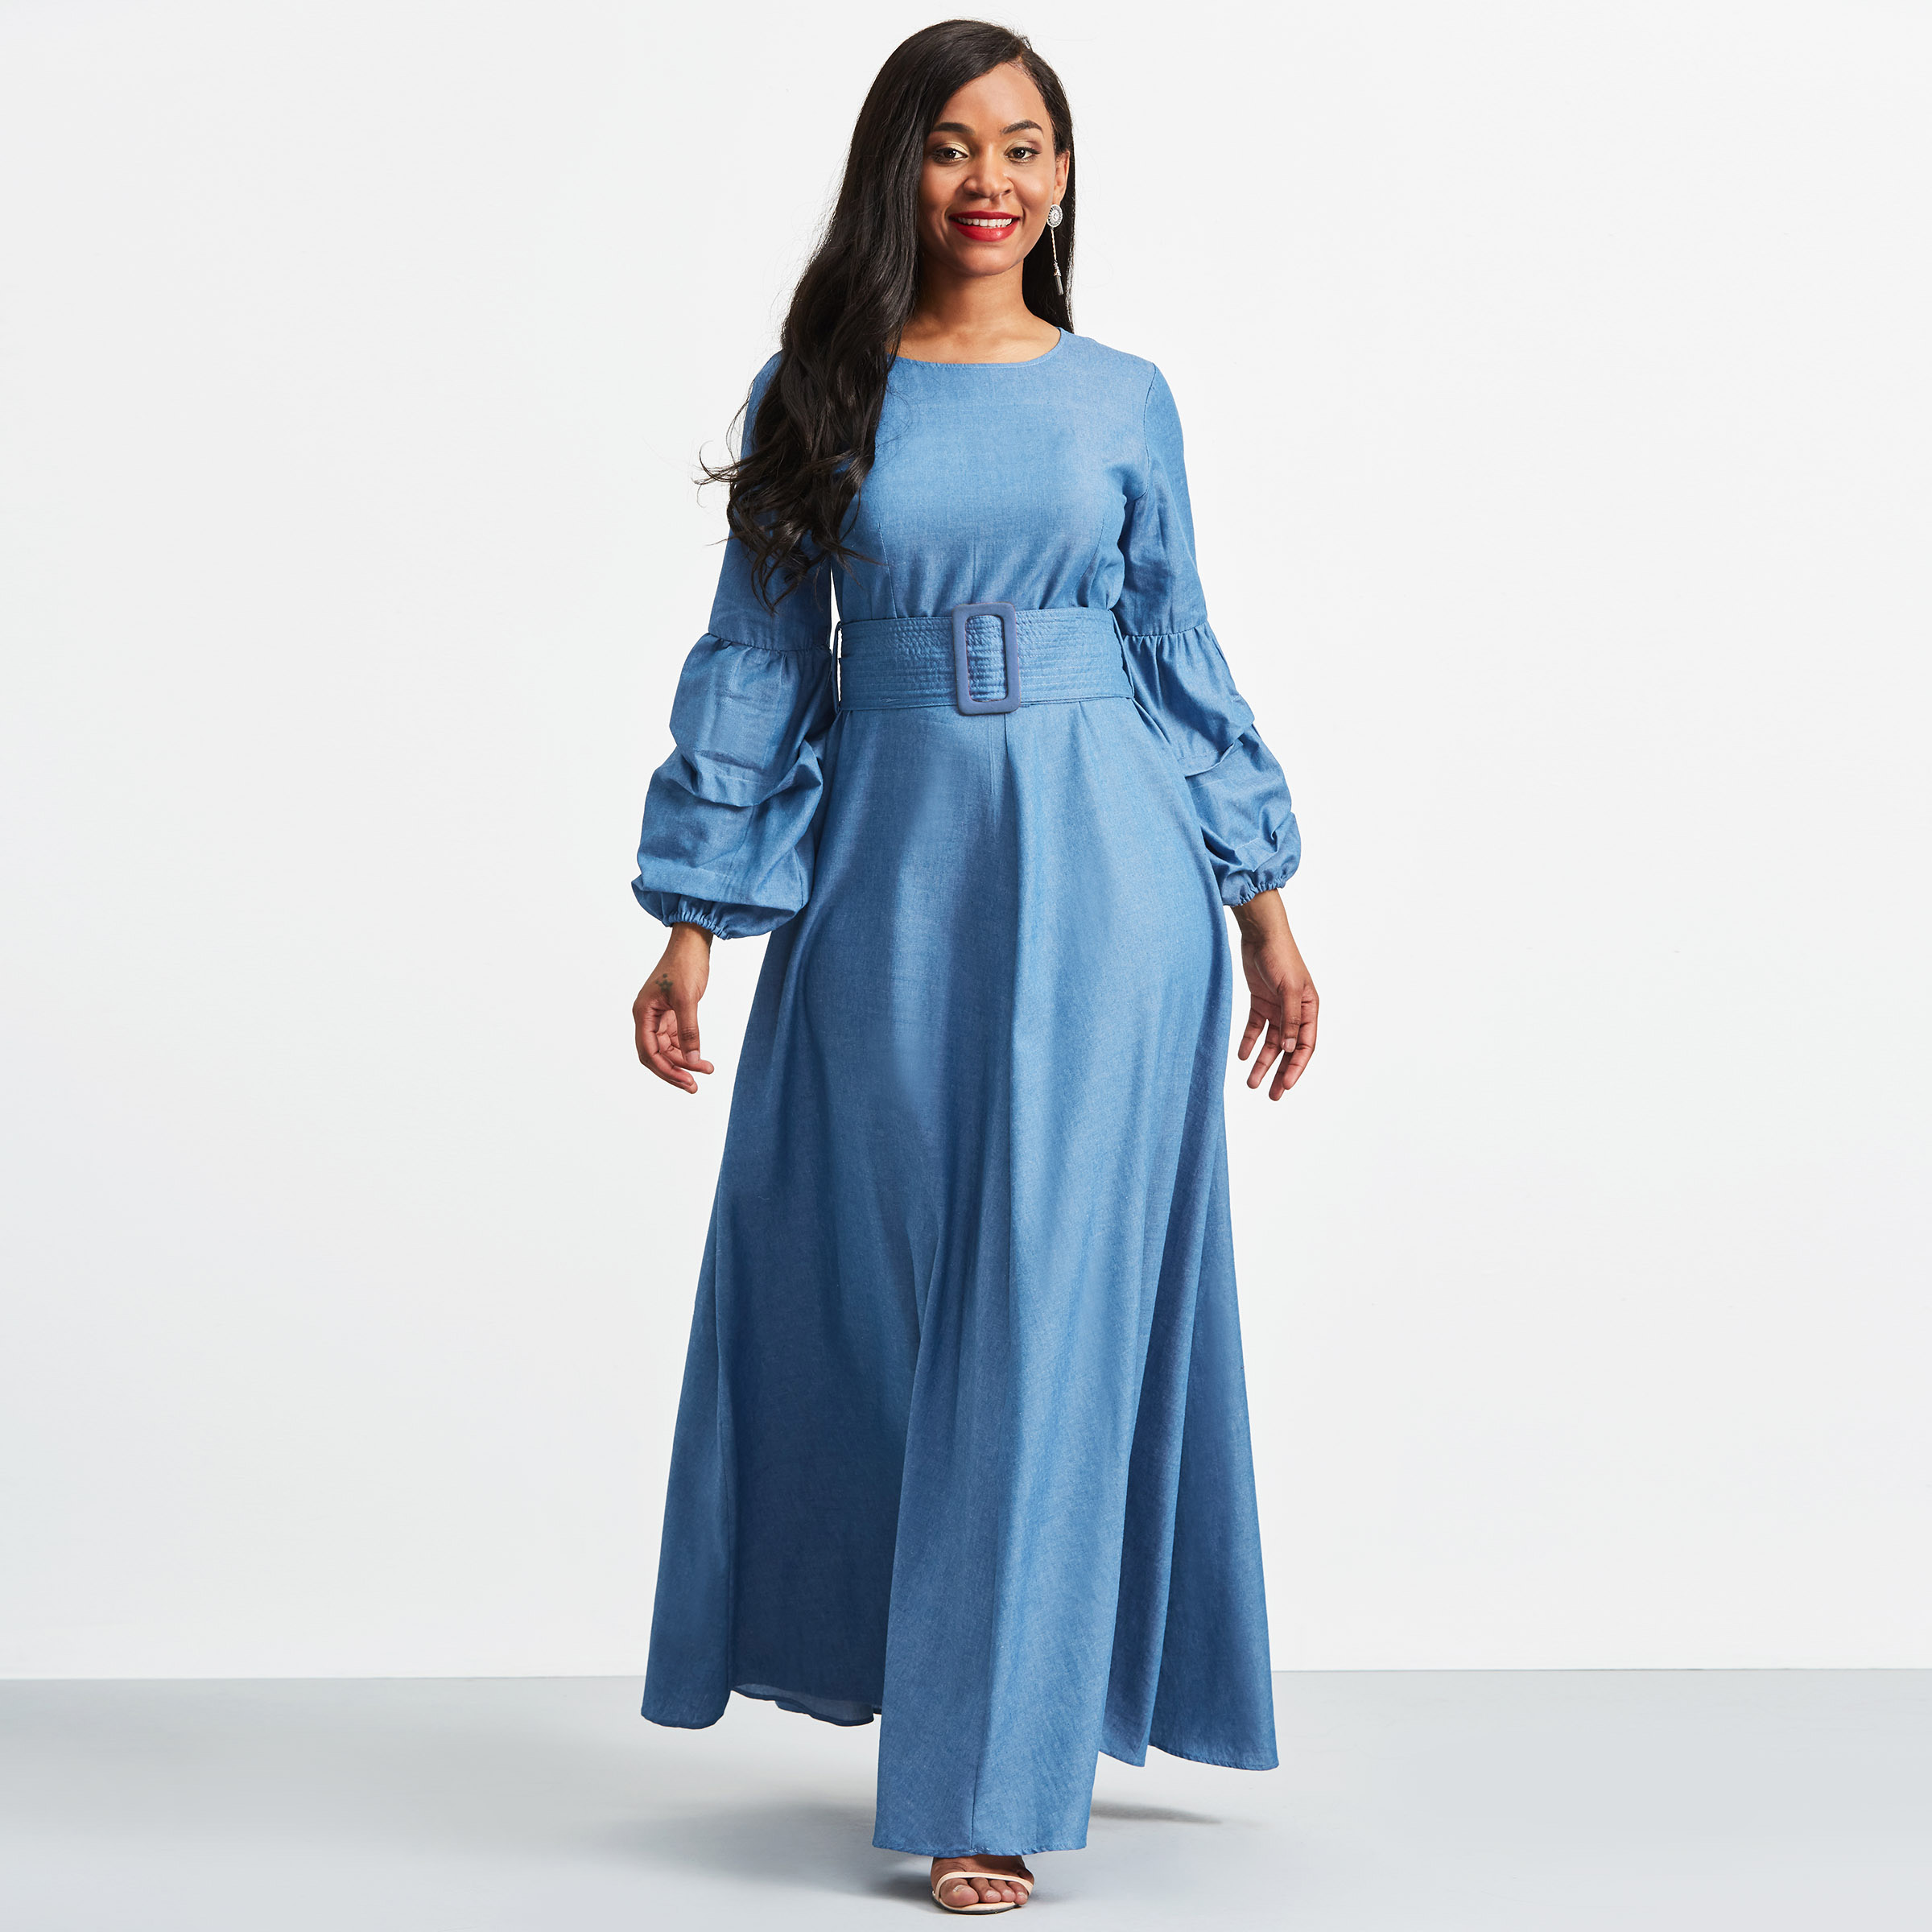 Aliexpress.com : Buy Women long Dresses Winter Autumn Long Sleeve ...